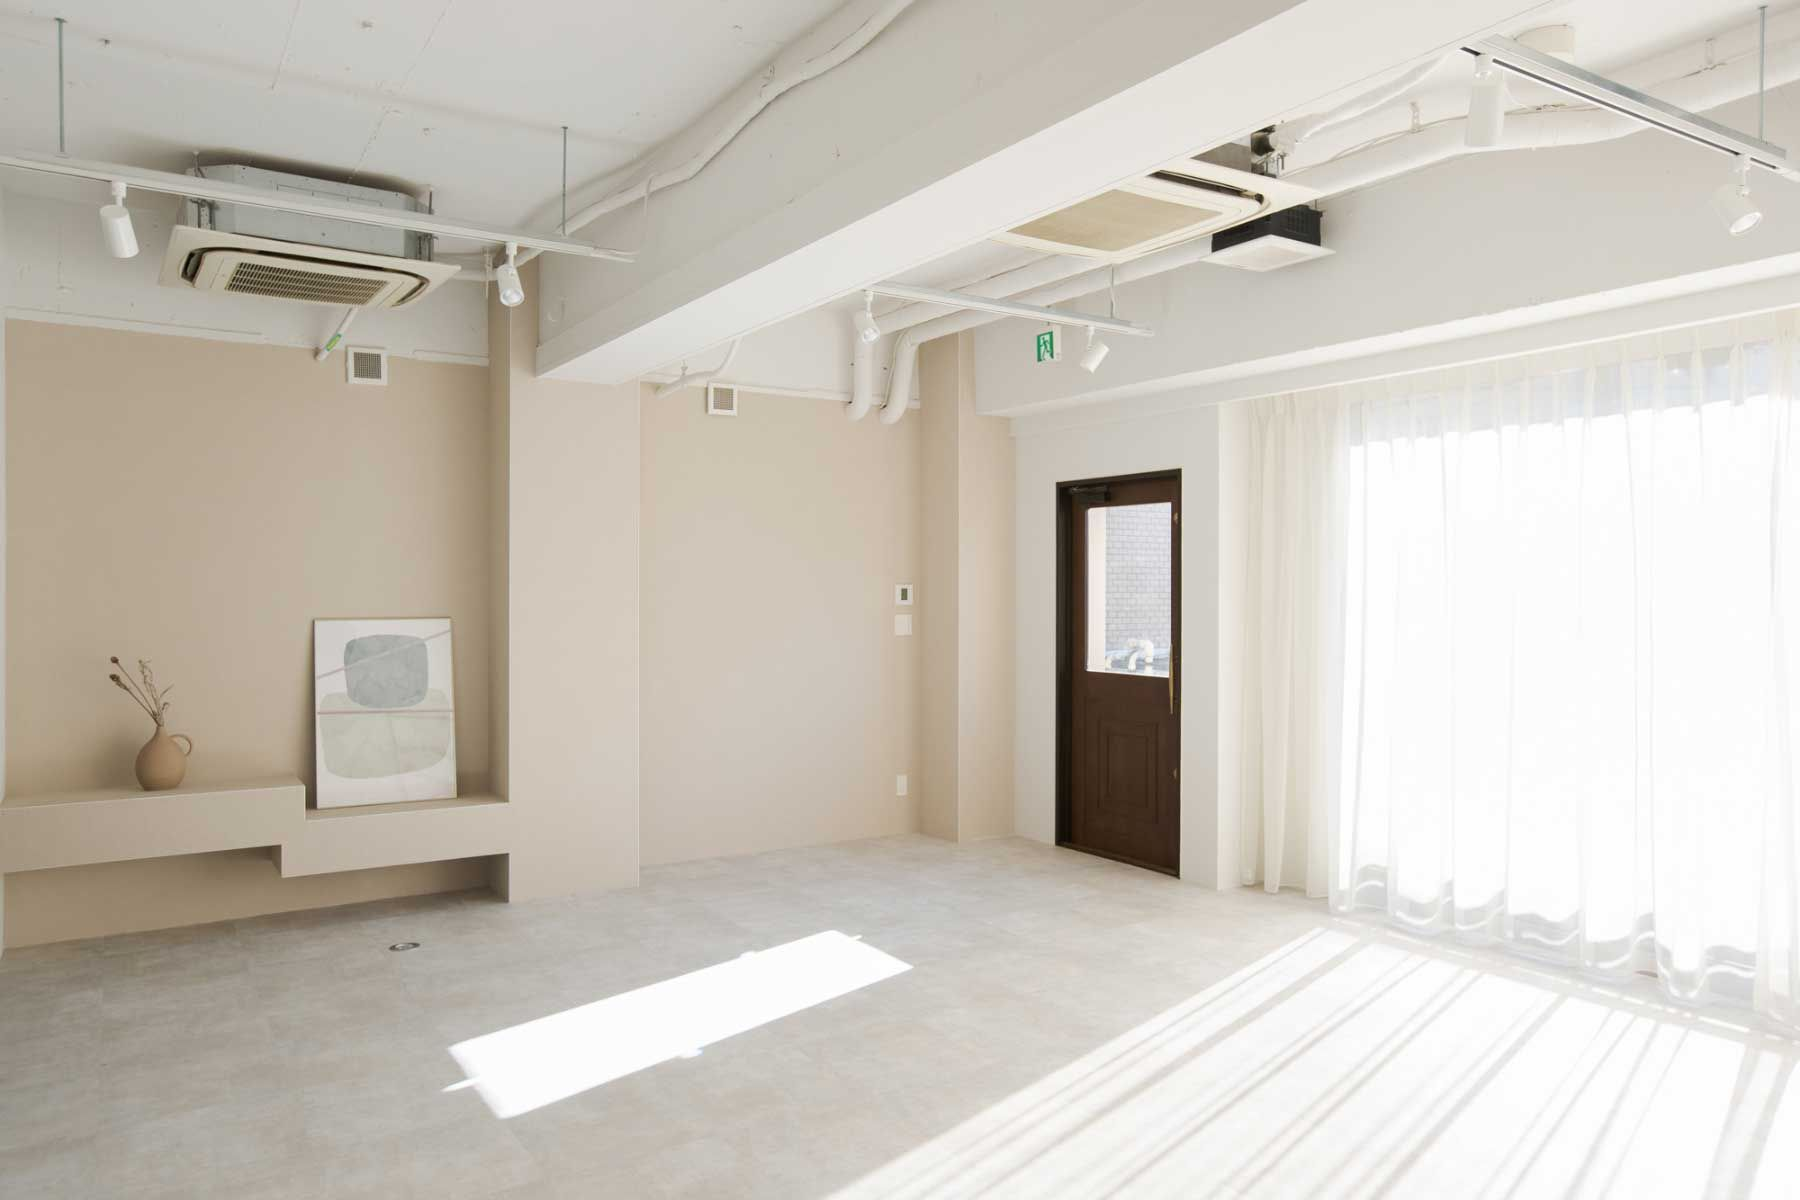 studio ankaa (スタジオ アンカー)午後の自然光